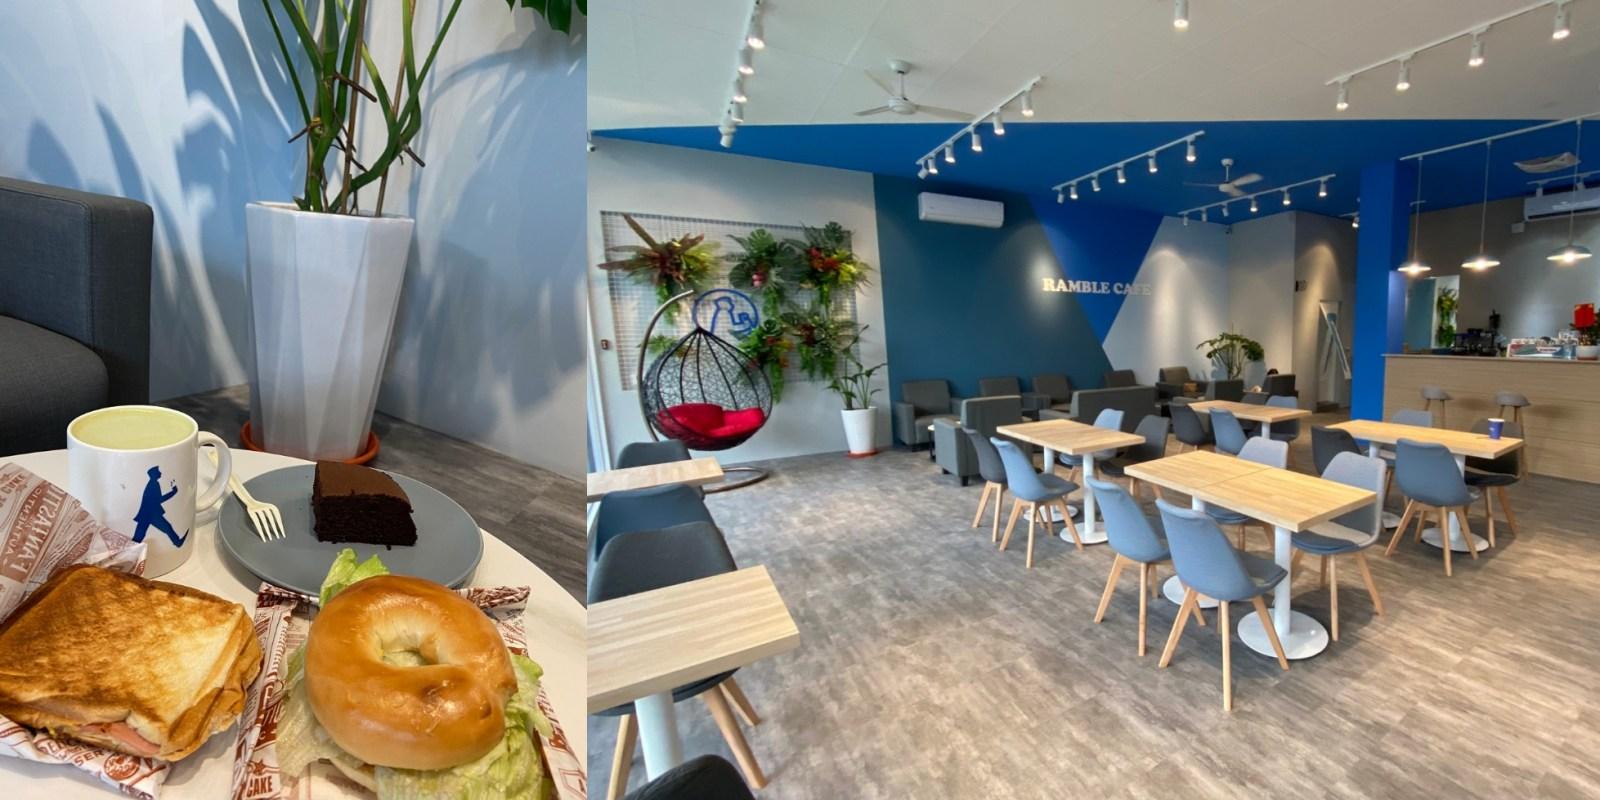 Ramble Cafe漫步藍咖啡 田中美食,田中咖啡,田中早餐。